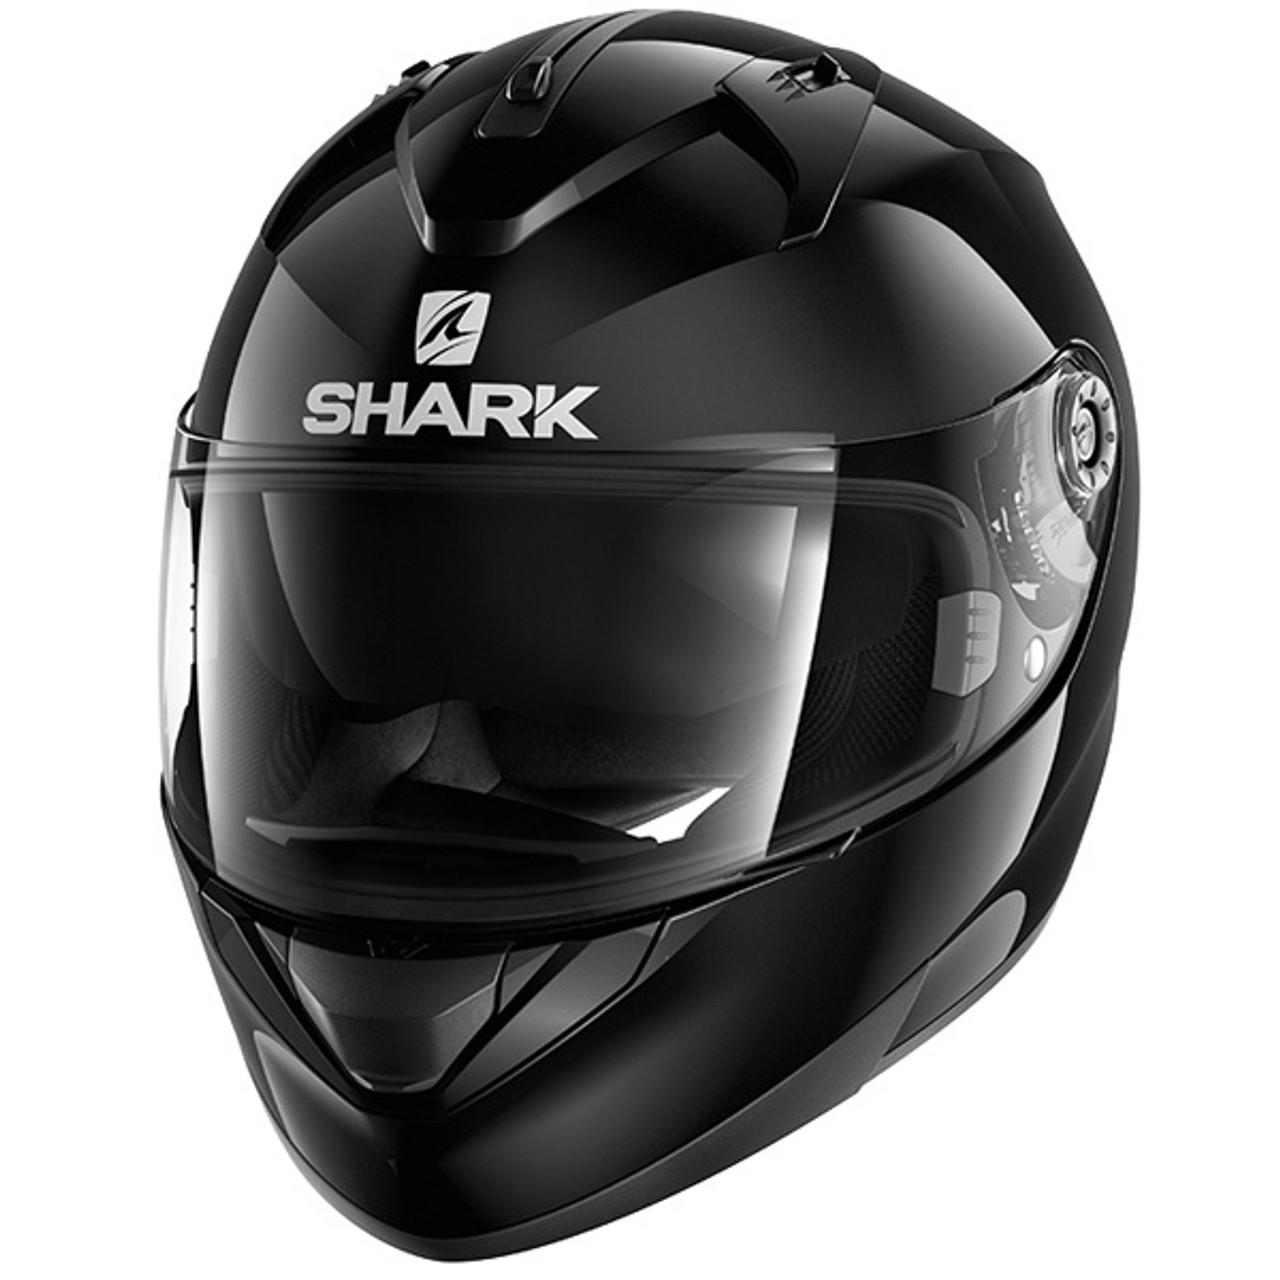 Shark Ridill Blank - Black